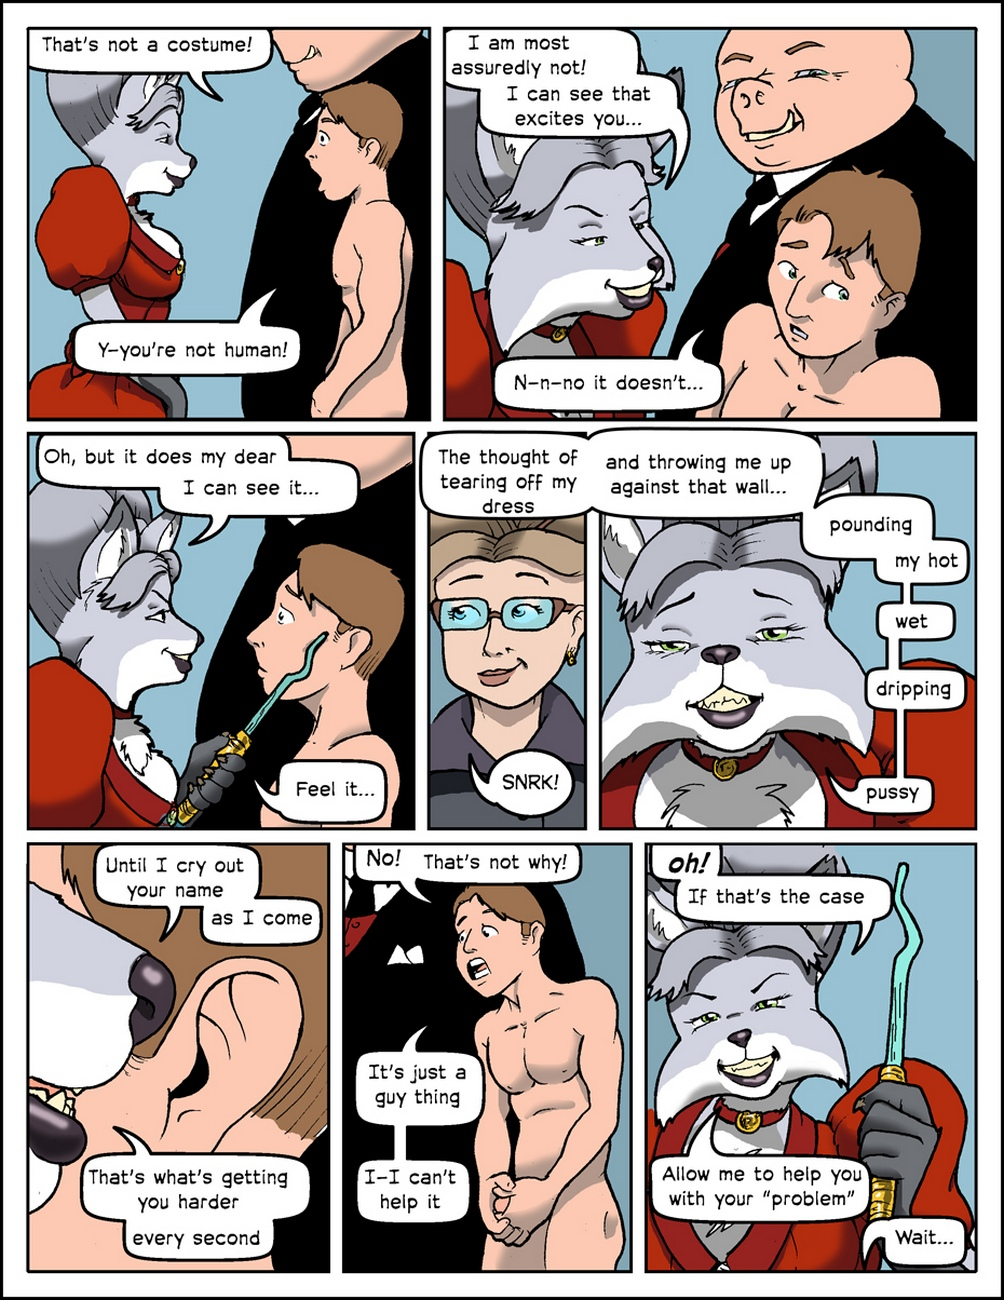 Bespoke-Companions 9 free sex comic